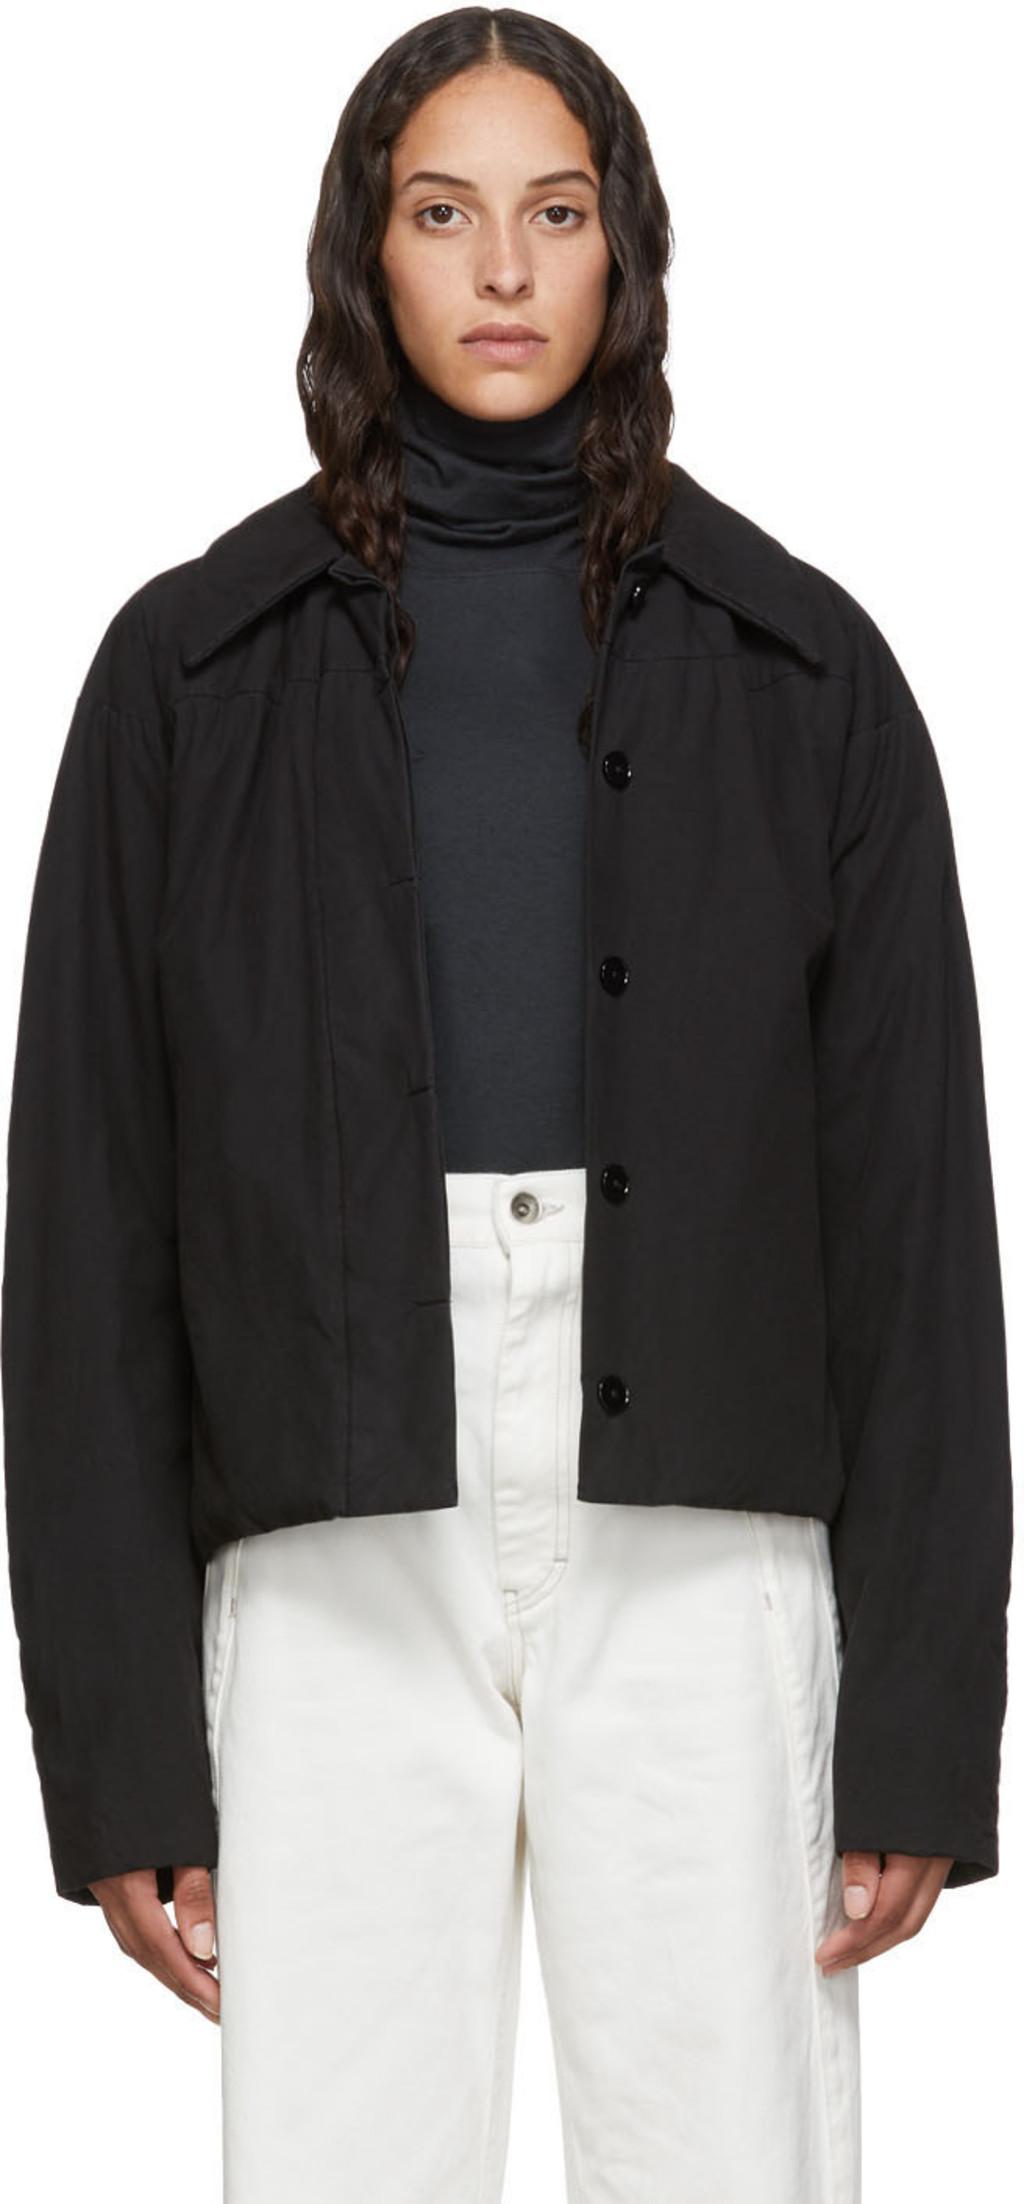 7e84cbf80 Black Blouson Jacket